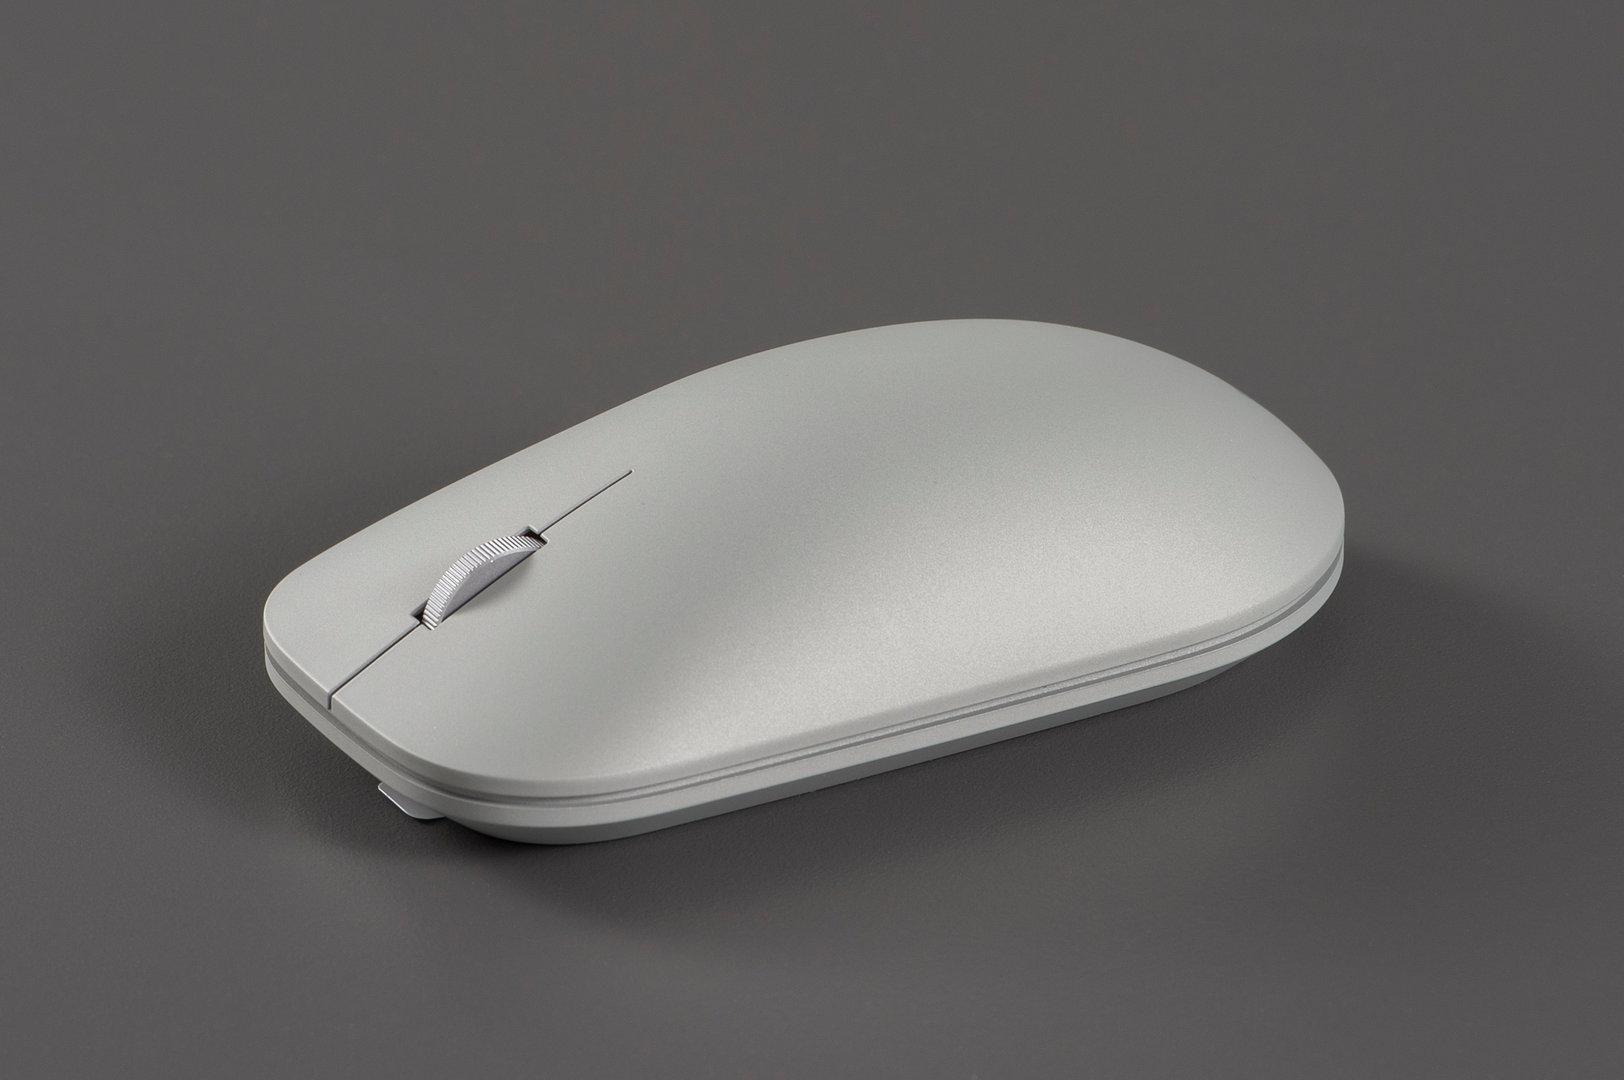 Surface Maus